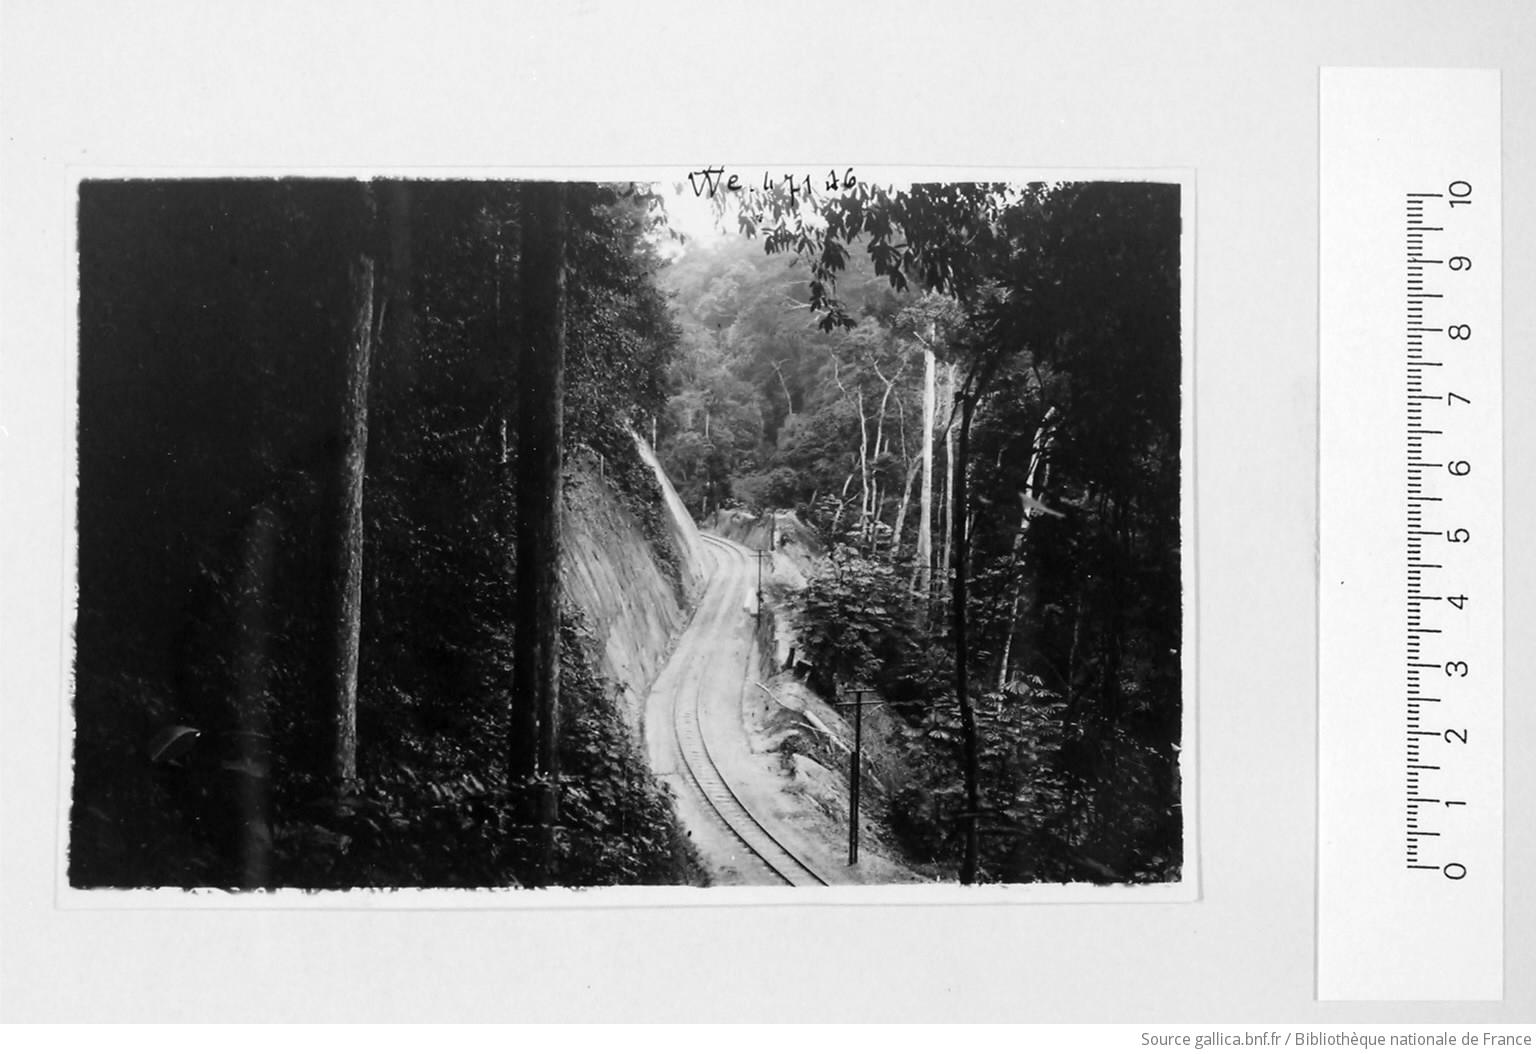 [39 phot. d'A.E.F. en 1924. Enregistré en 1936] - 16